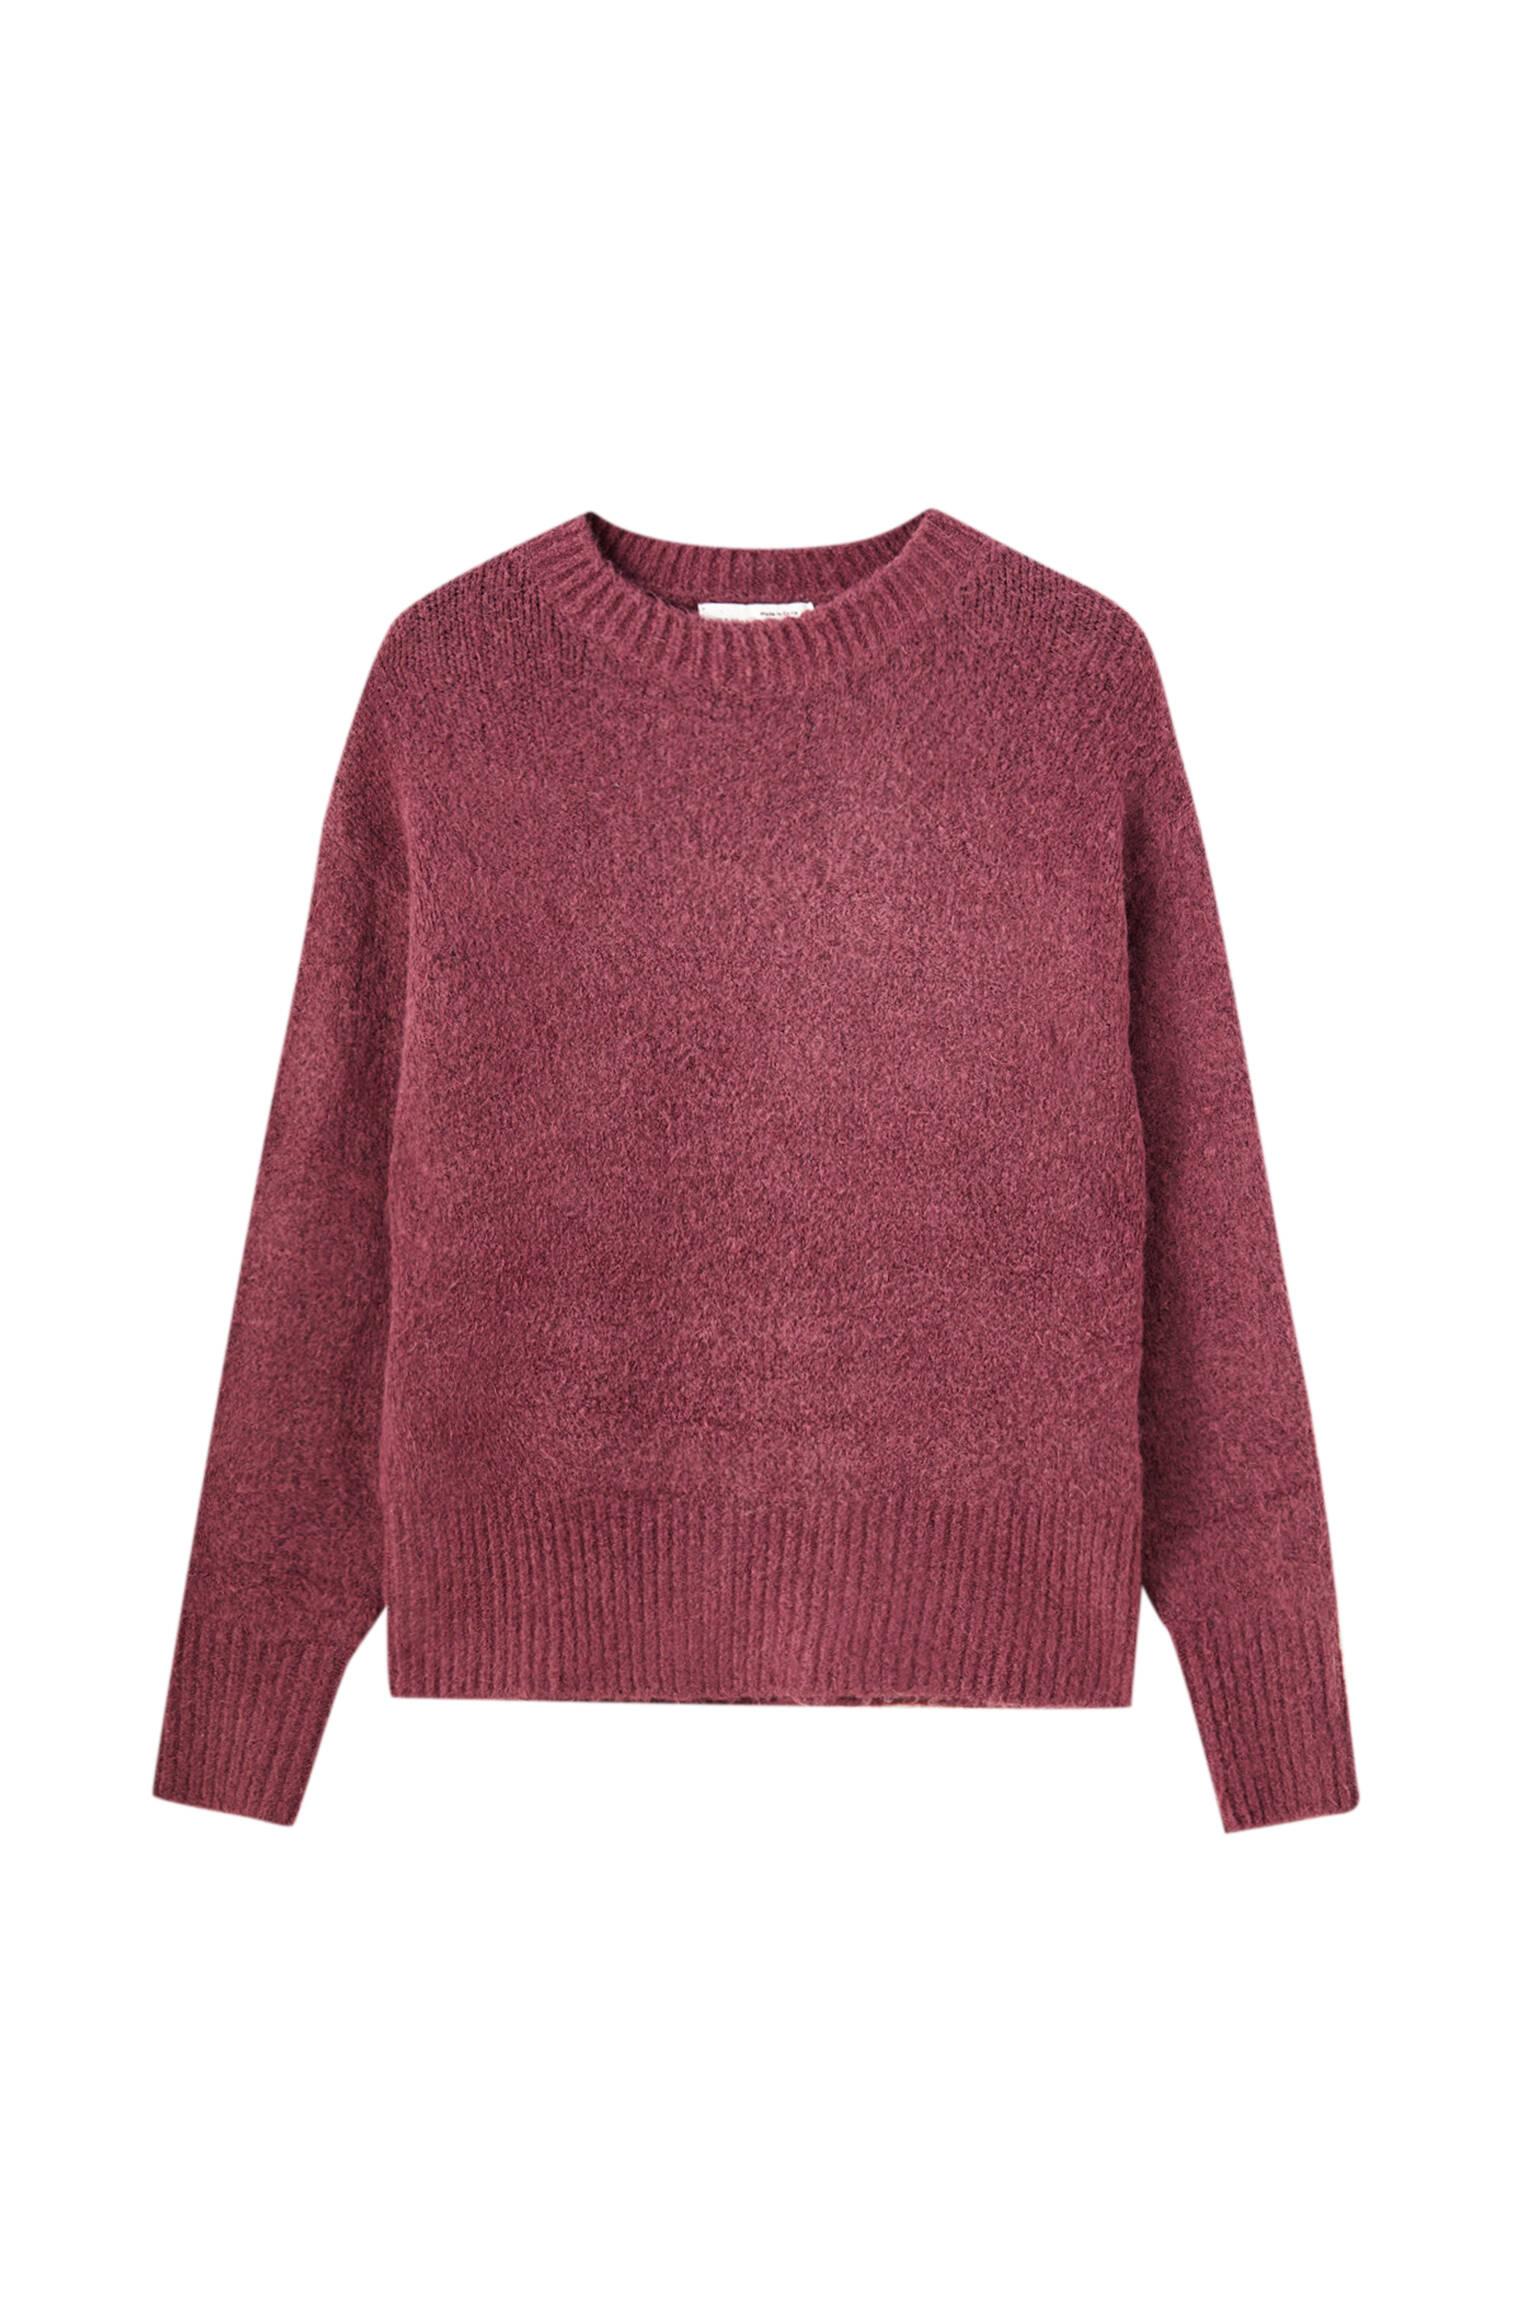 ЦВЕТ ИНЖИРА Мягкий свитер из синтетической шерсти Pull & Bear